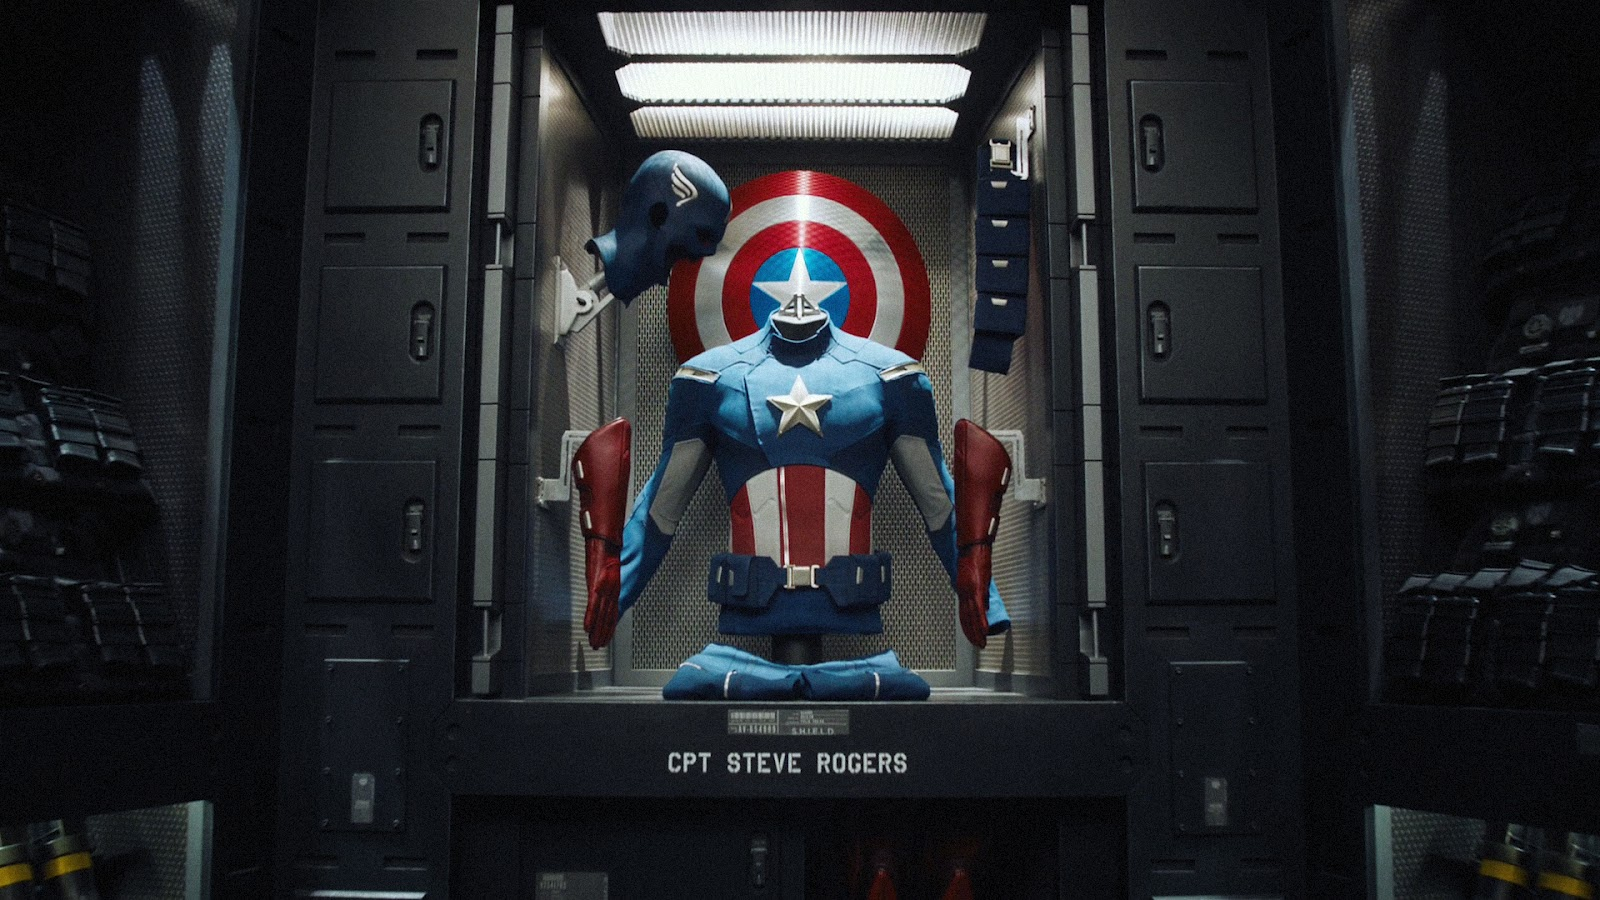 1920x1080 Hd Wallpaper Avengers hd wallon 1600x900